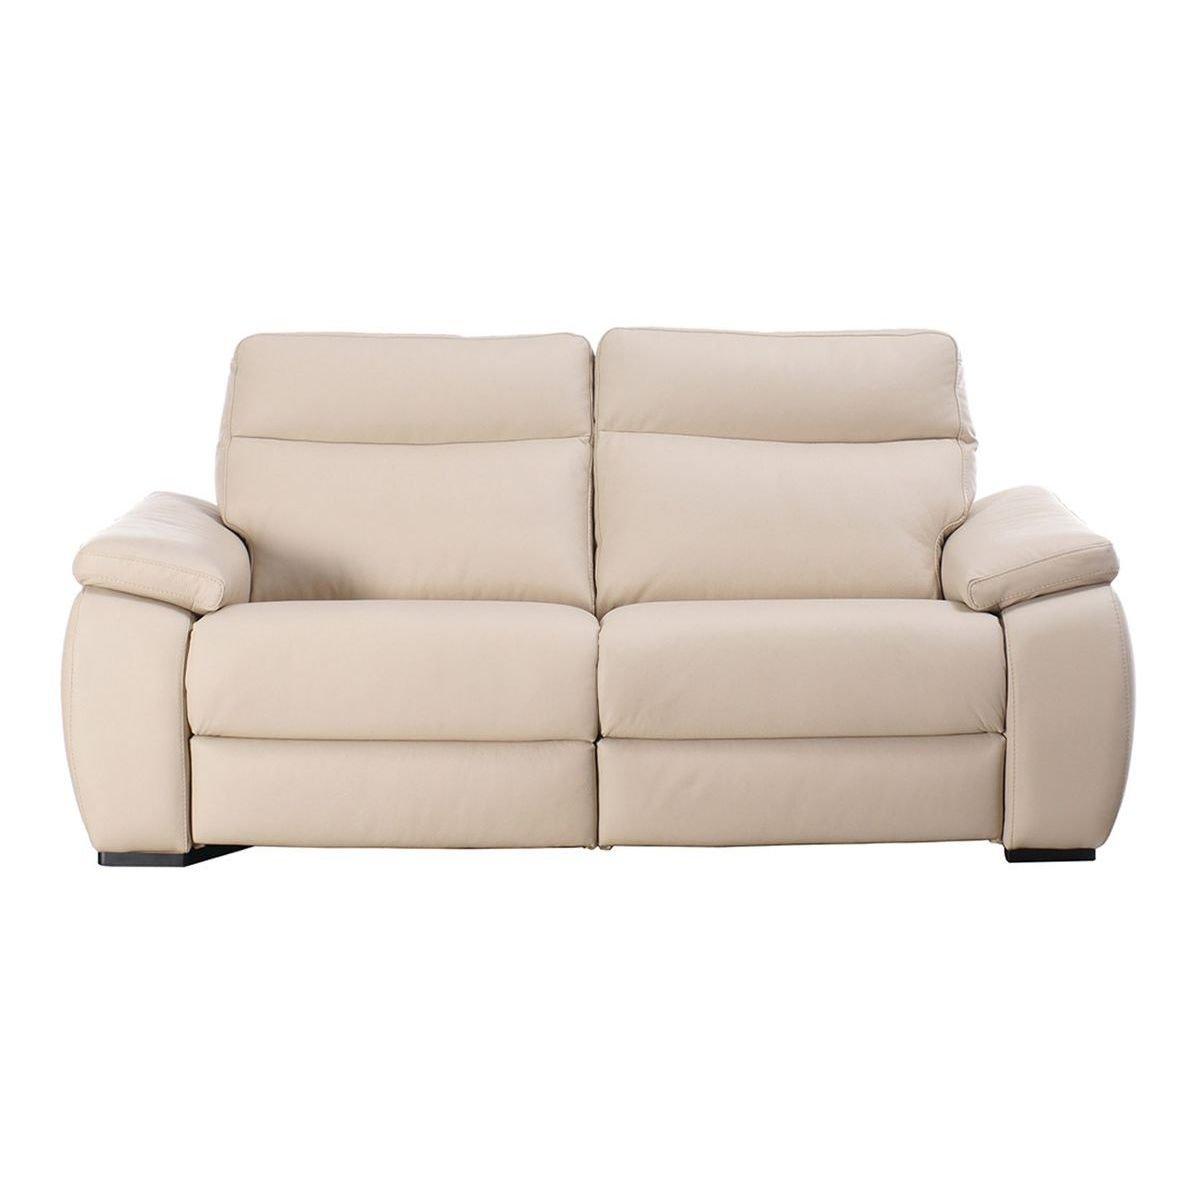 sofa en ingles motion set sofás modernos el corte inglés